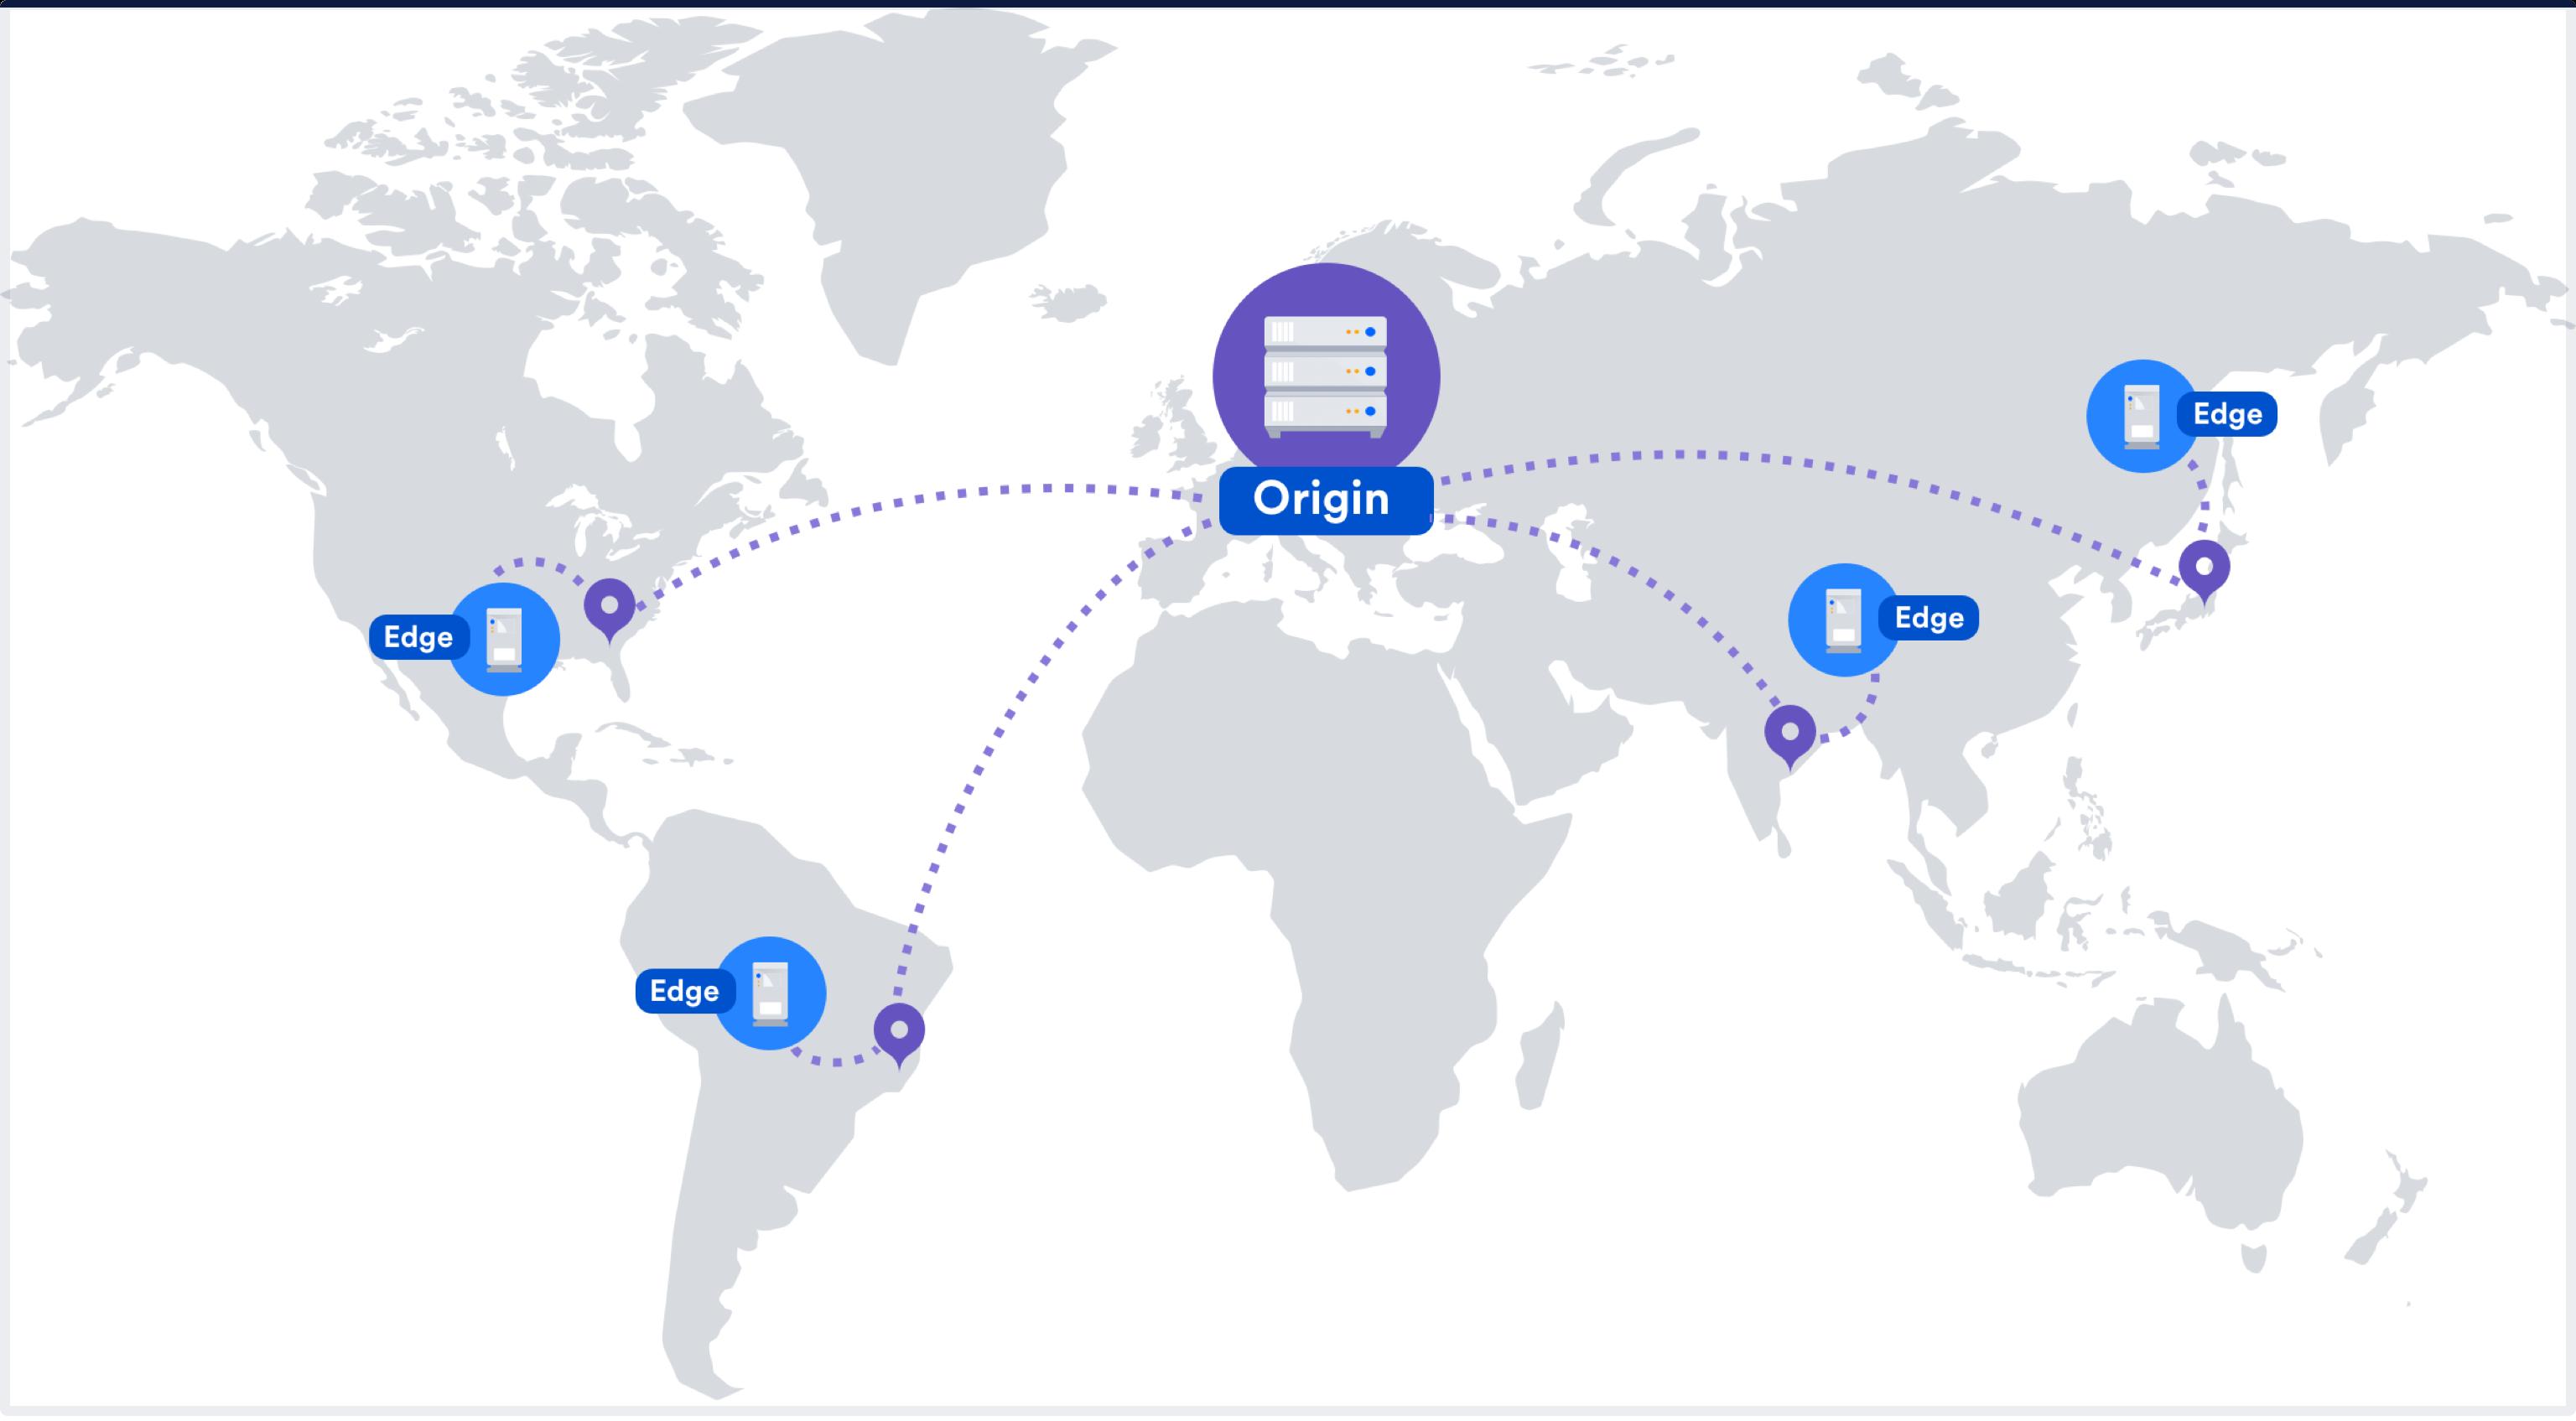 cdn ネットワークを示す世界地図